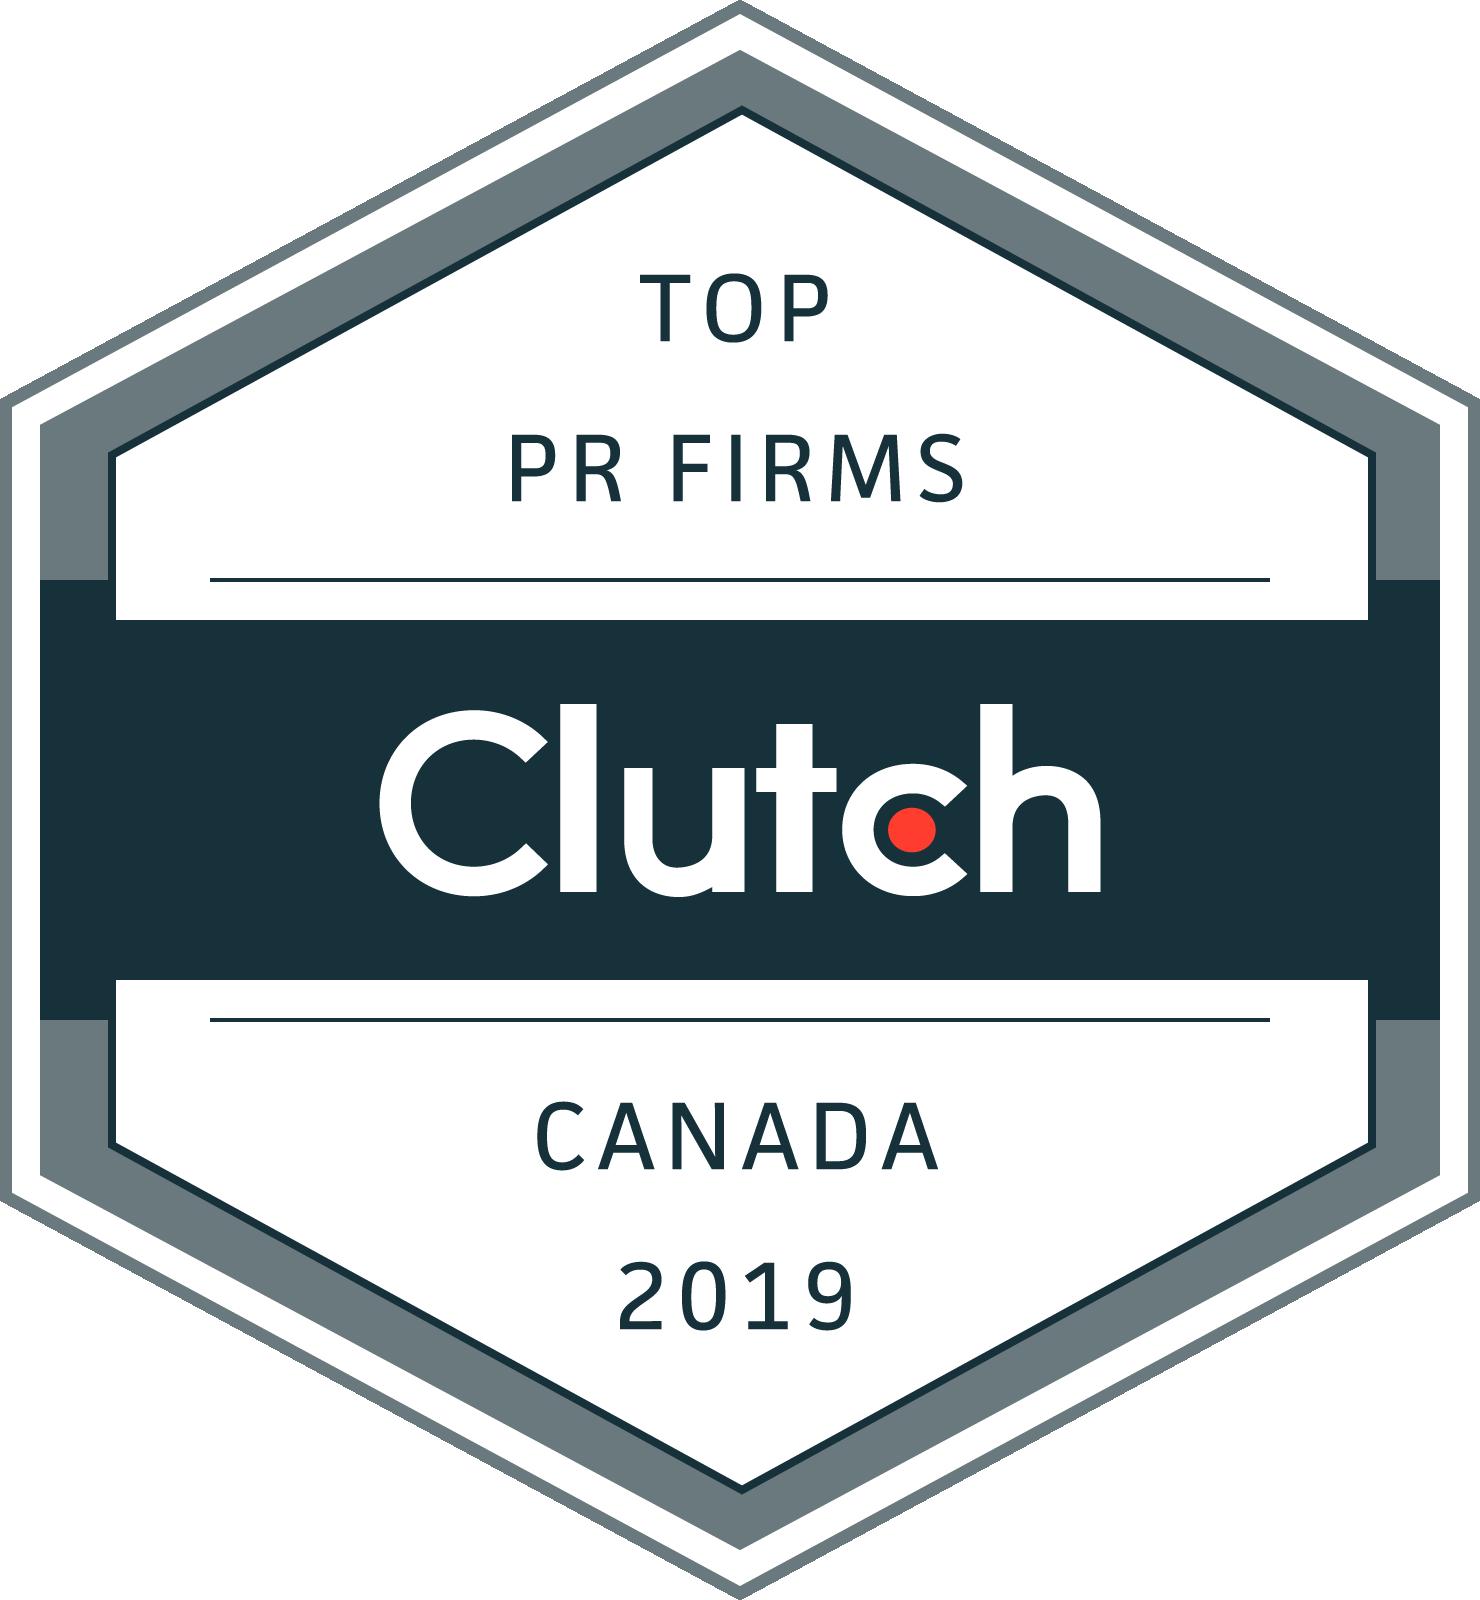 Top PR Firm 2019